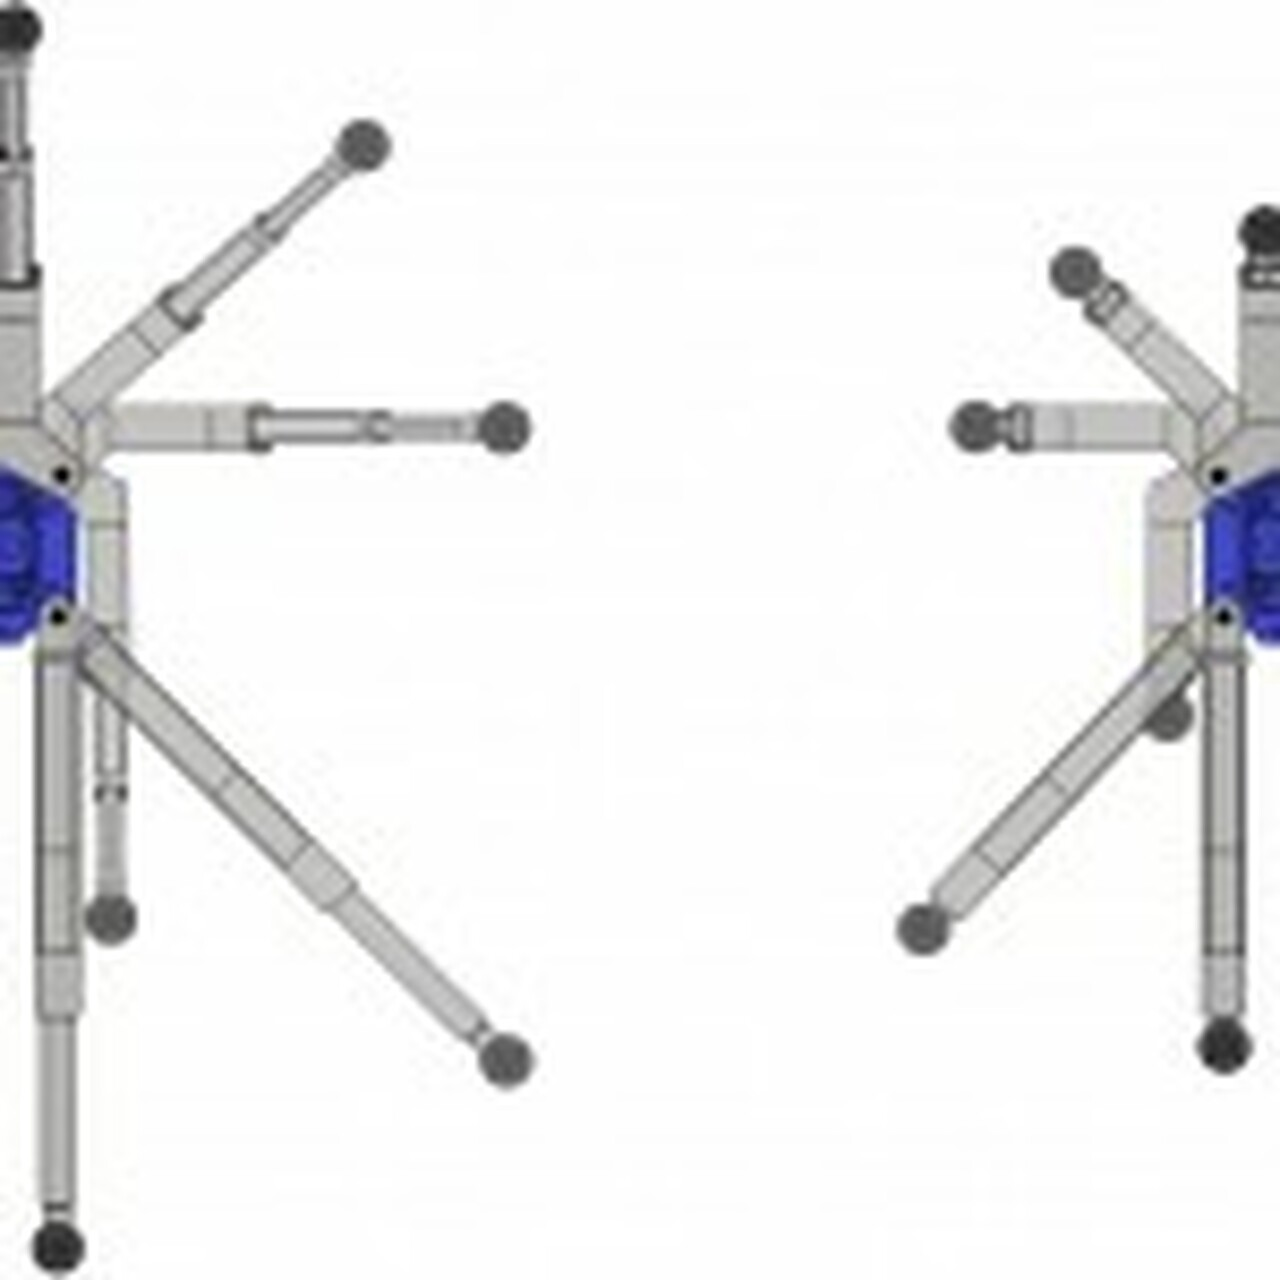 tp11kc-dx-180-degree-front-arm-full-rotation